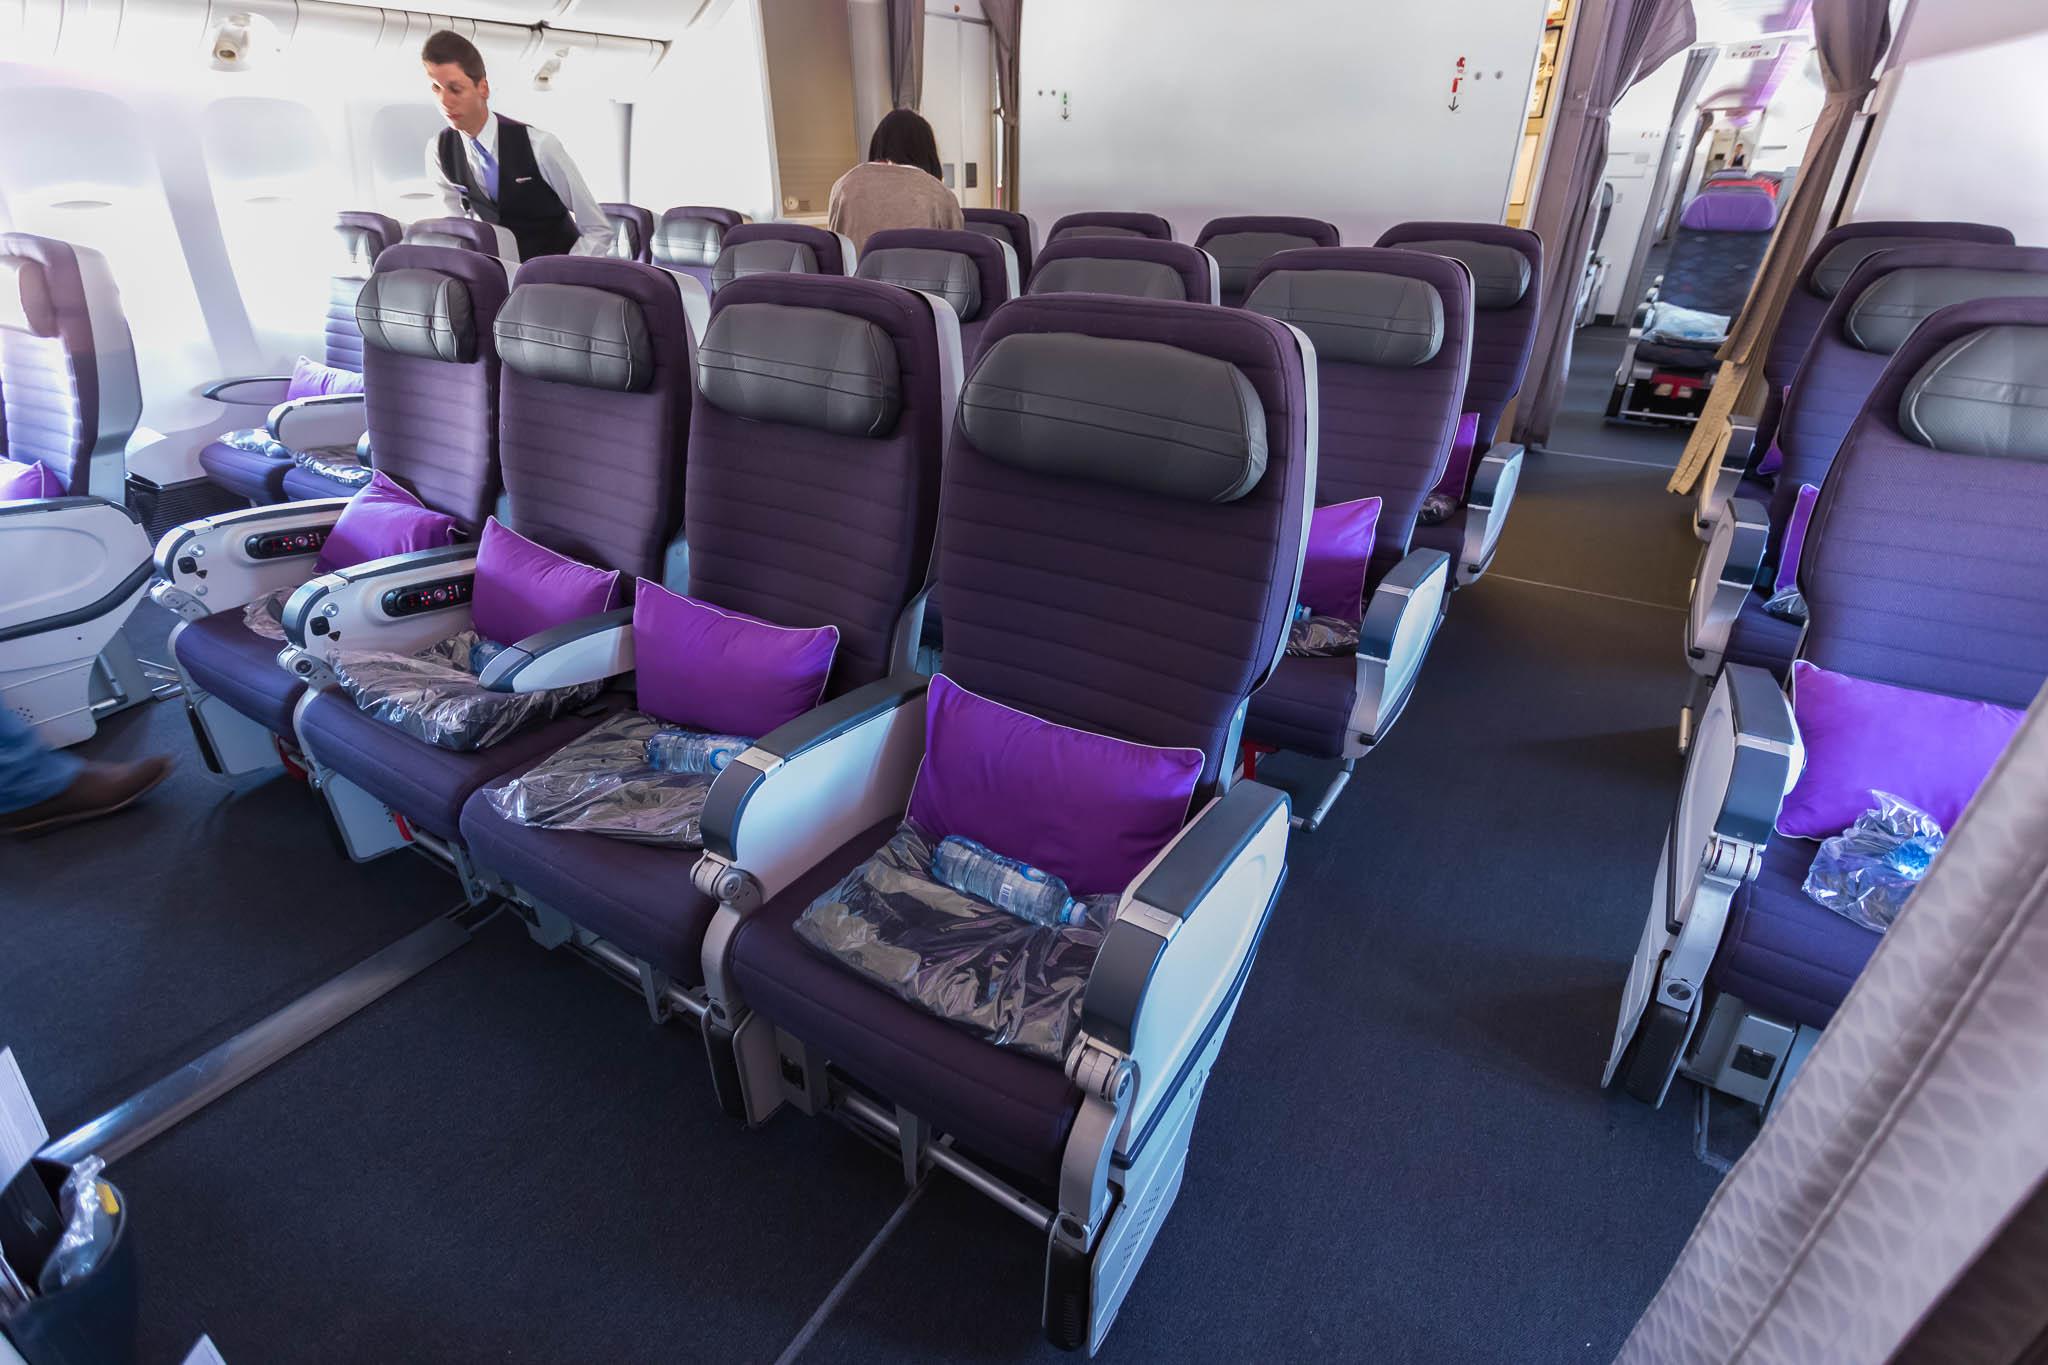 virgin long haul flights reviews